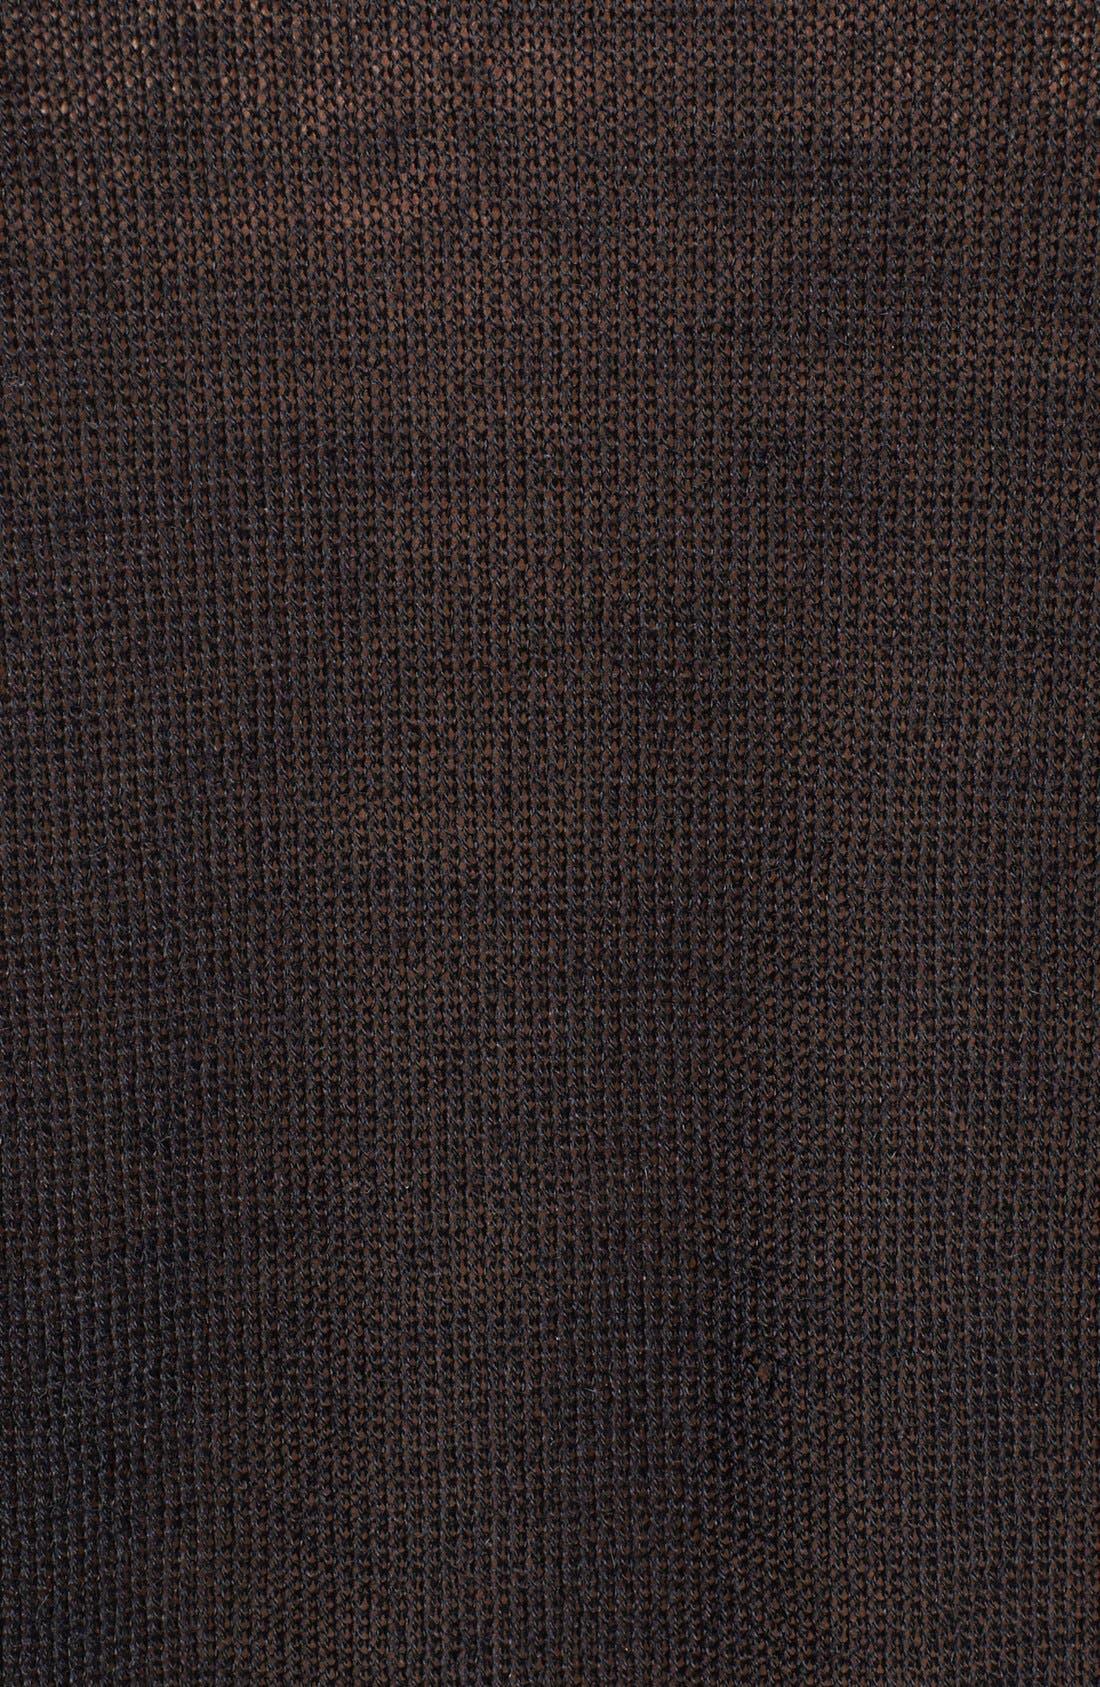 Alternate Image 3  - rag & bone 'Grace' Knit Top